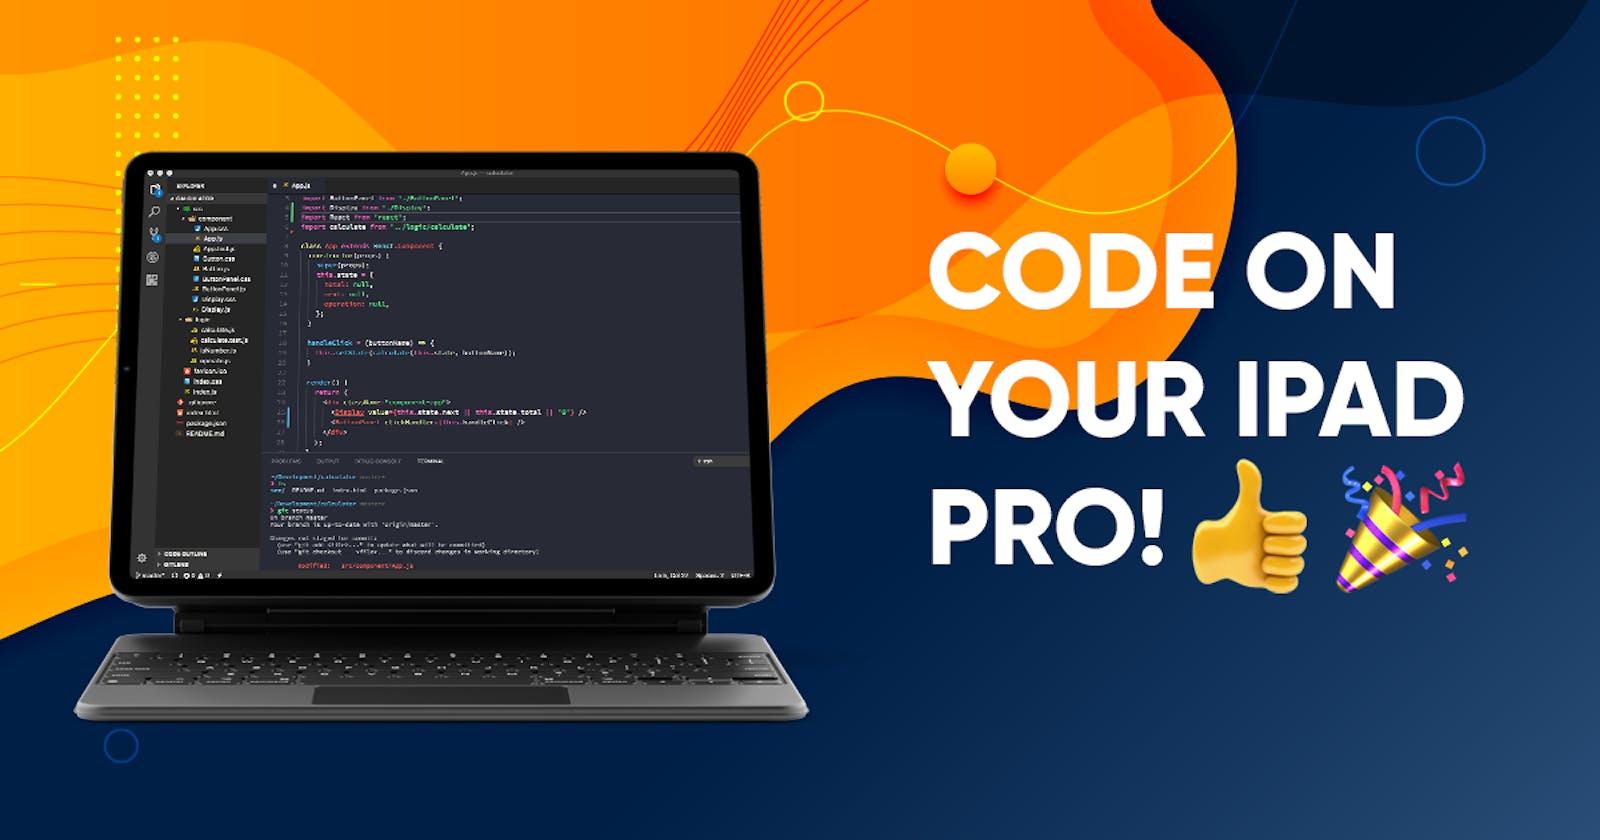 Code on Your iPad Pro